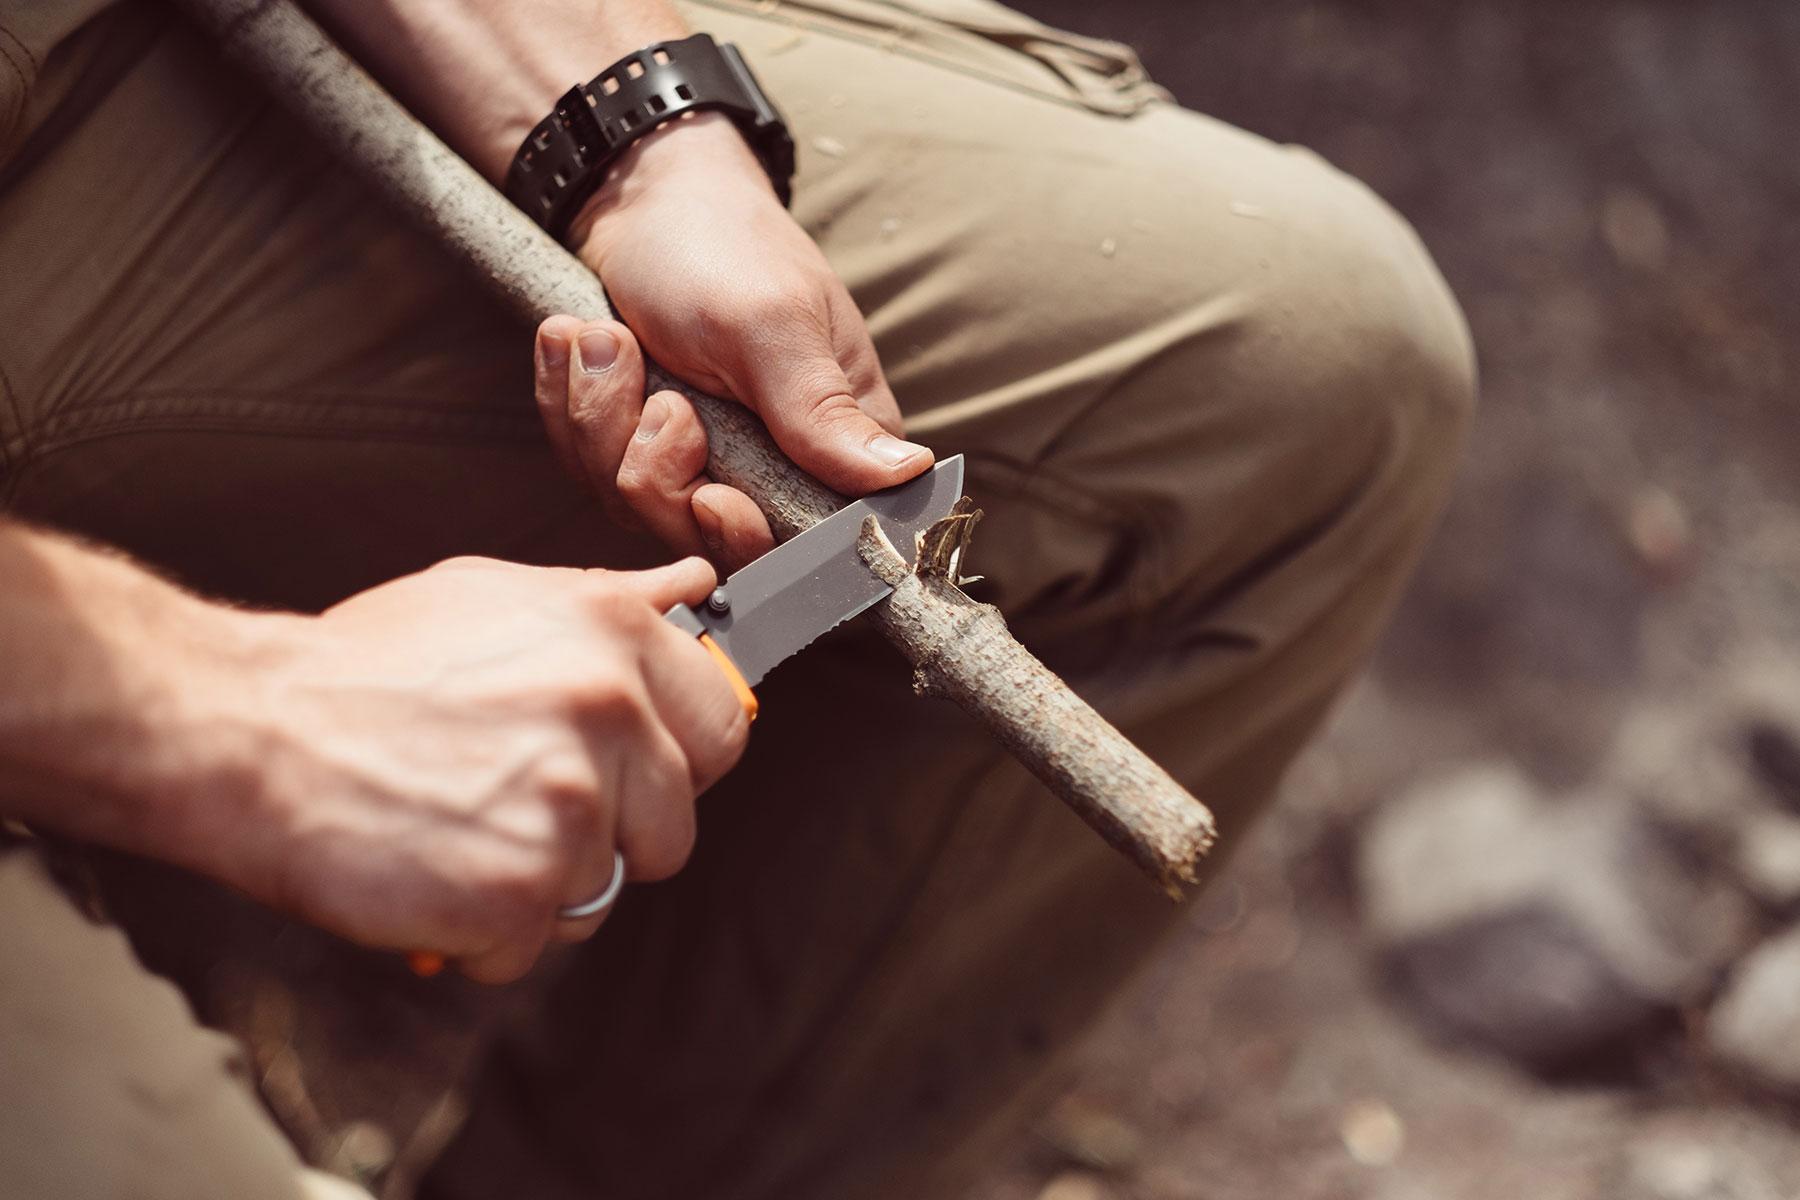 Tactical Game Corso di sopravvivenza Hike & Survive base